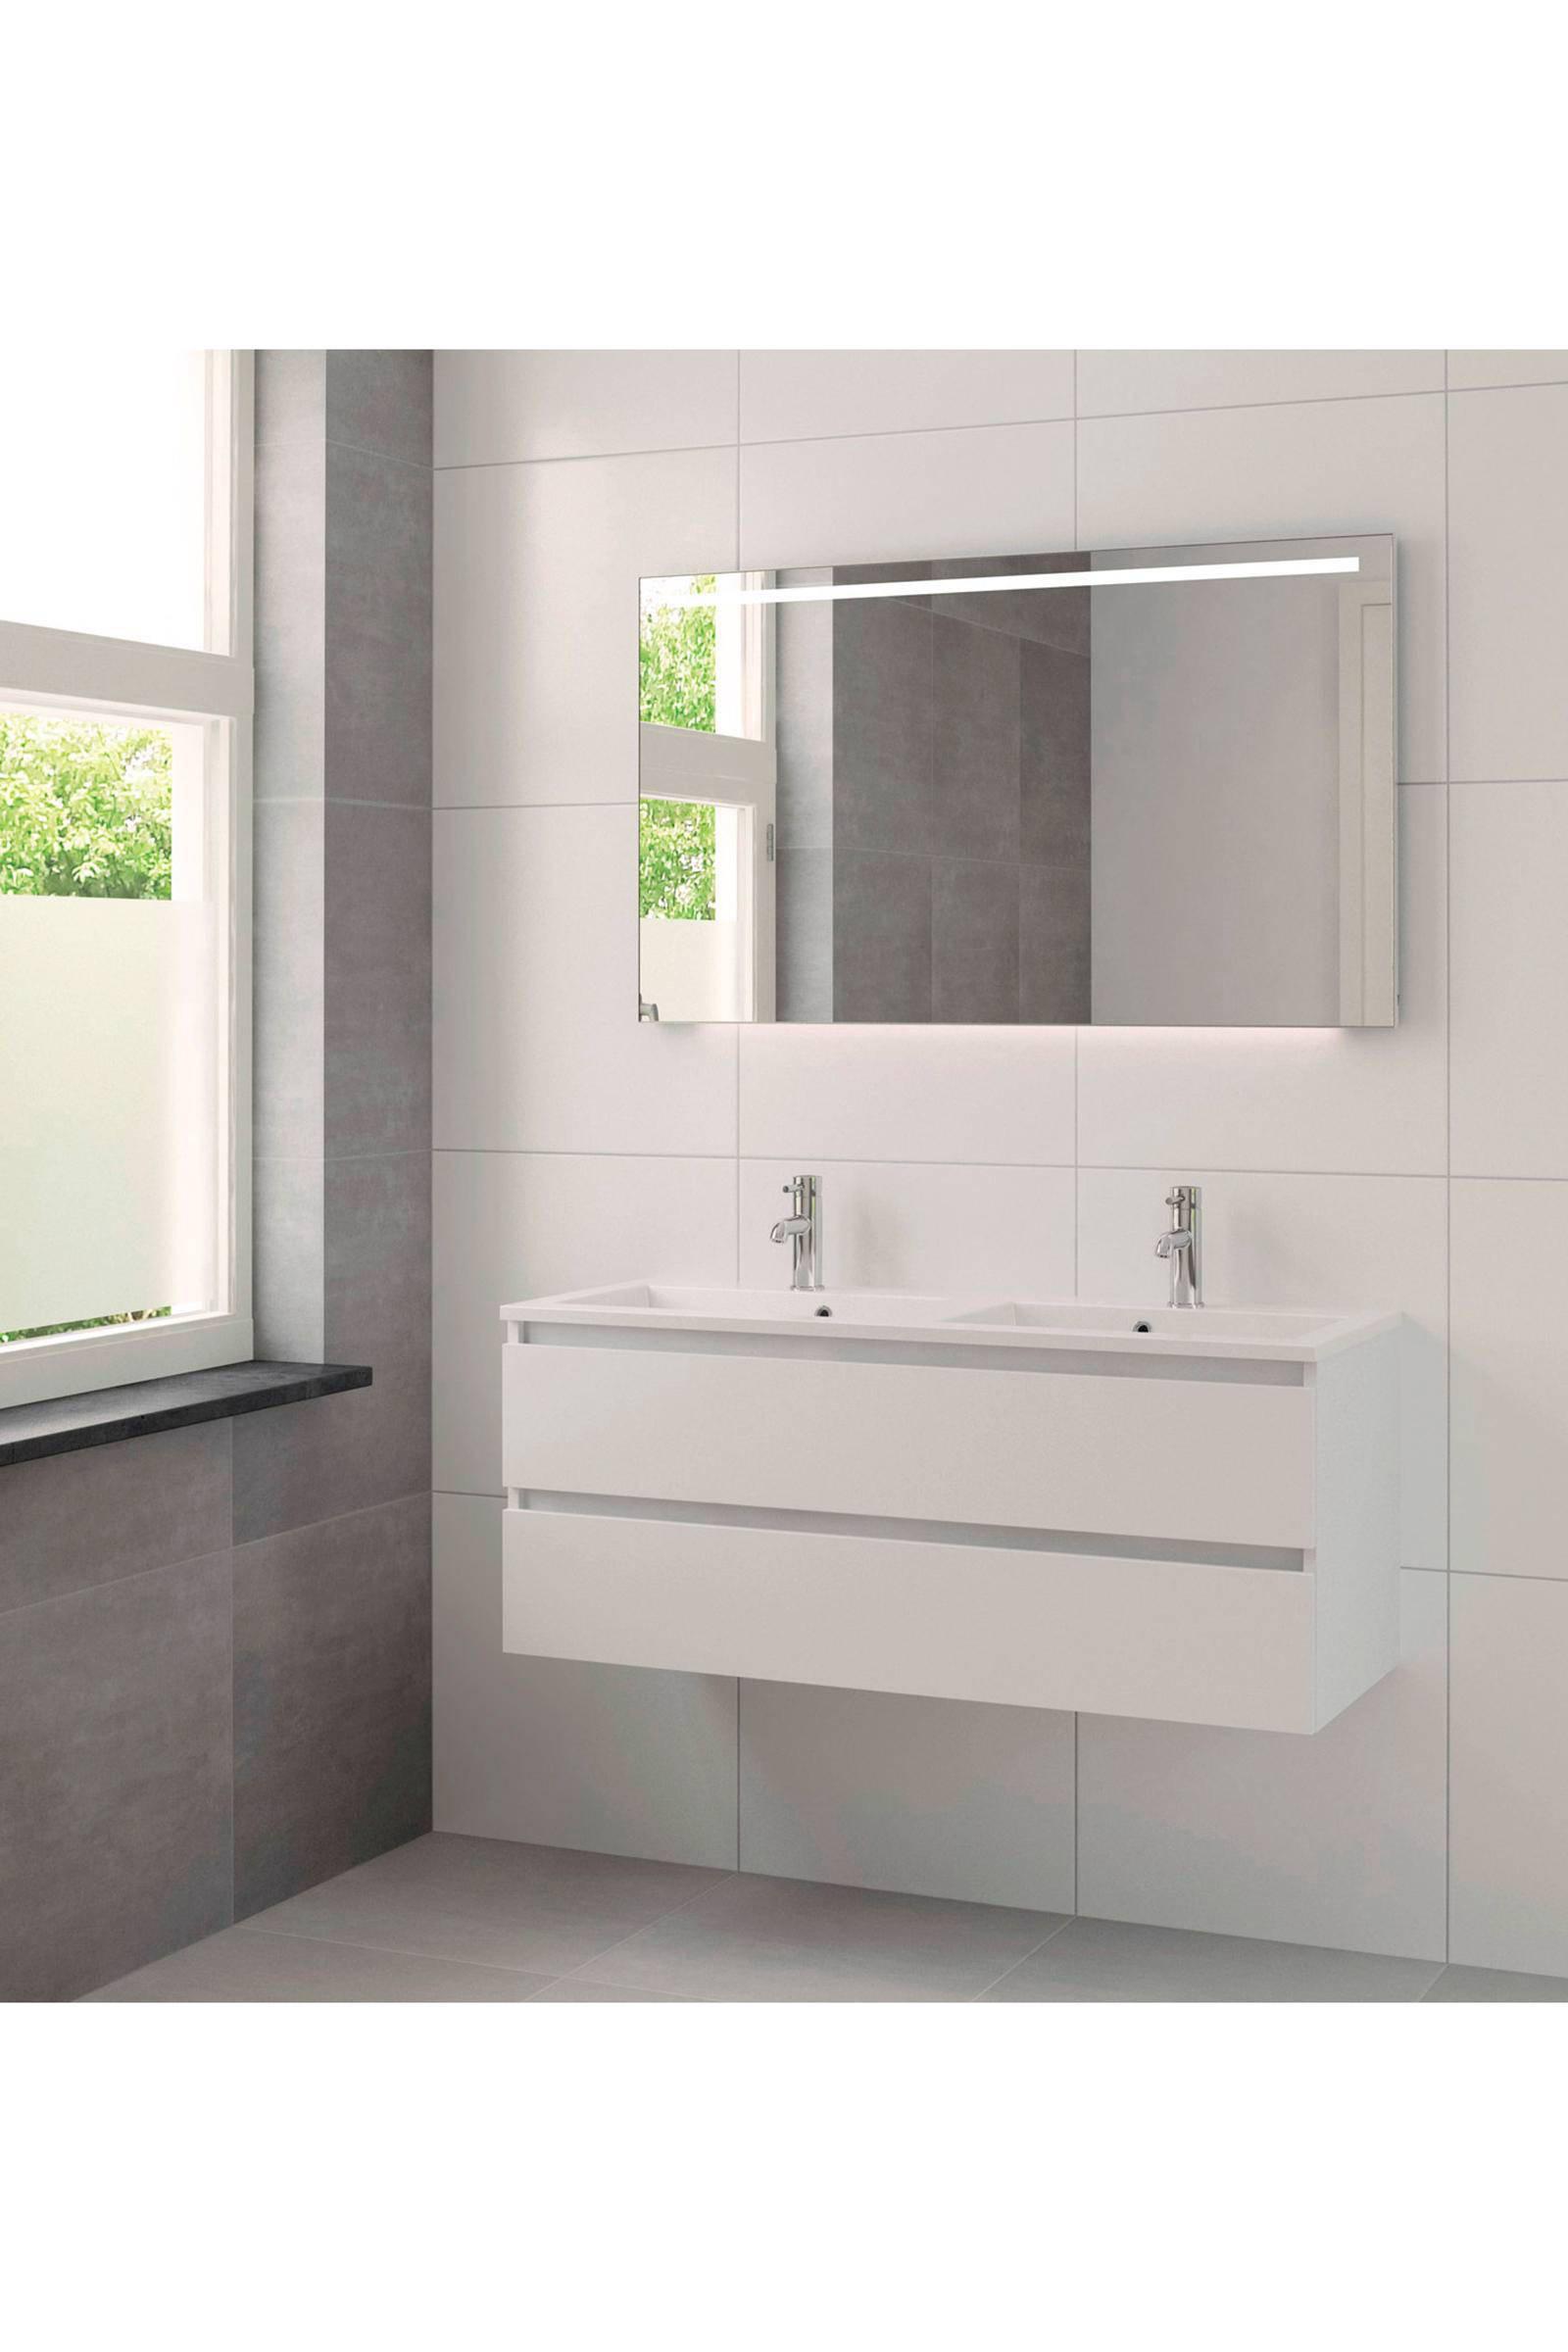 Bruynzeel sanitair badkamermeubel Cadiza 120